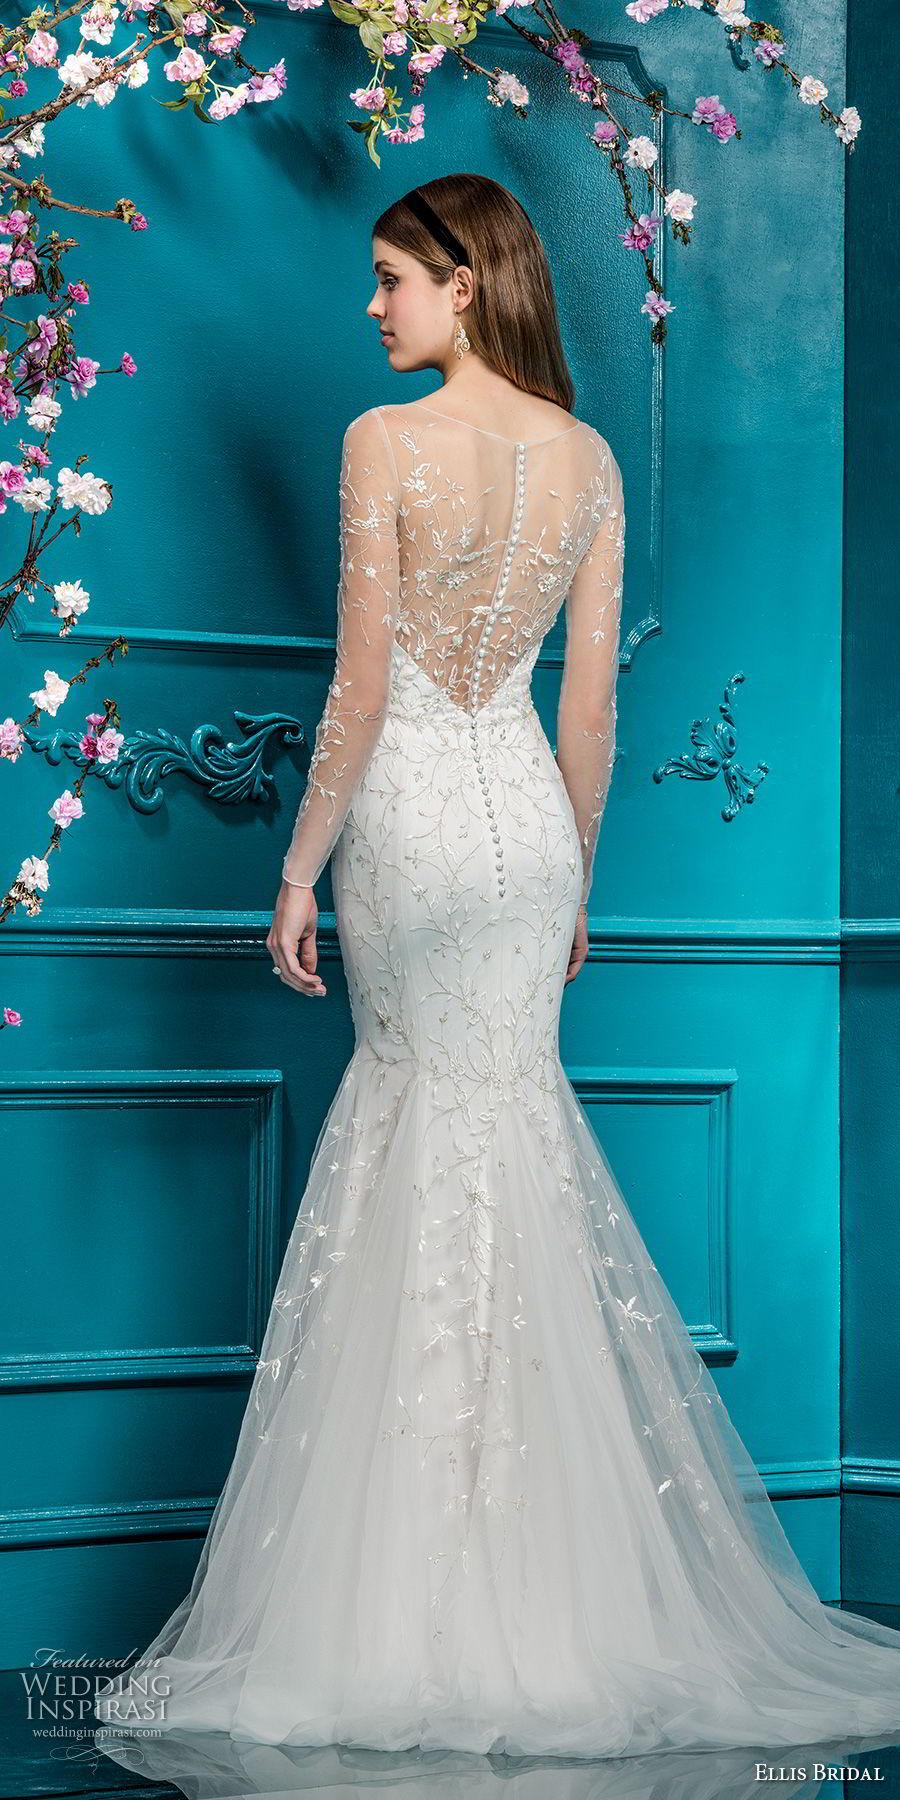 ellis bridals 2018 long sleeves illusion jewel sweetheart neckline heavily embellished bodice elegant mermaid wedding dress sheer back sweep train (17) bv